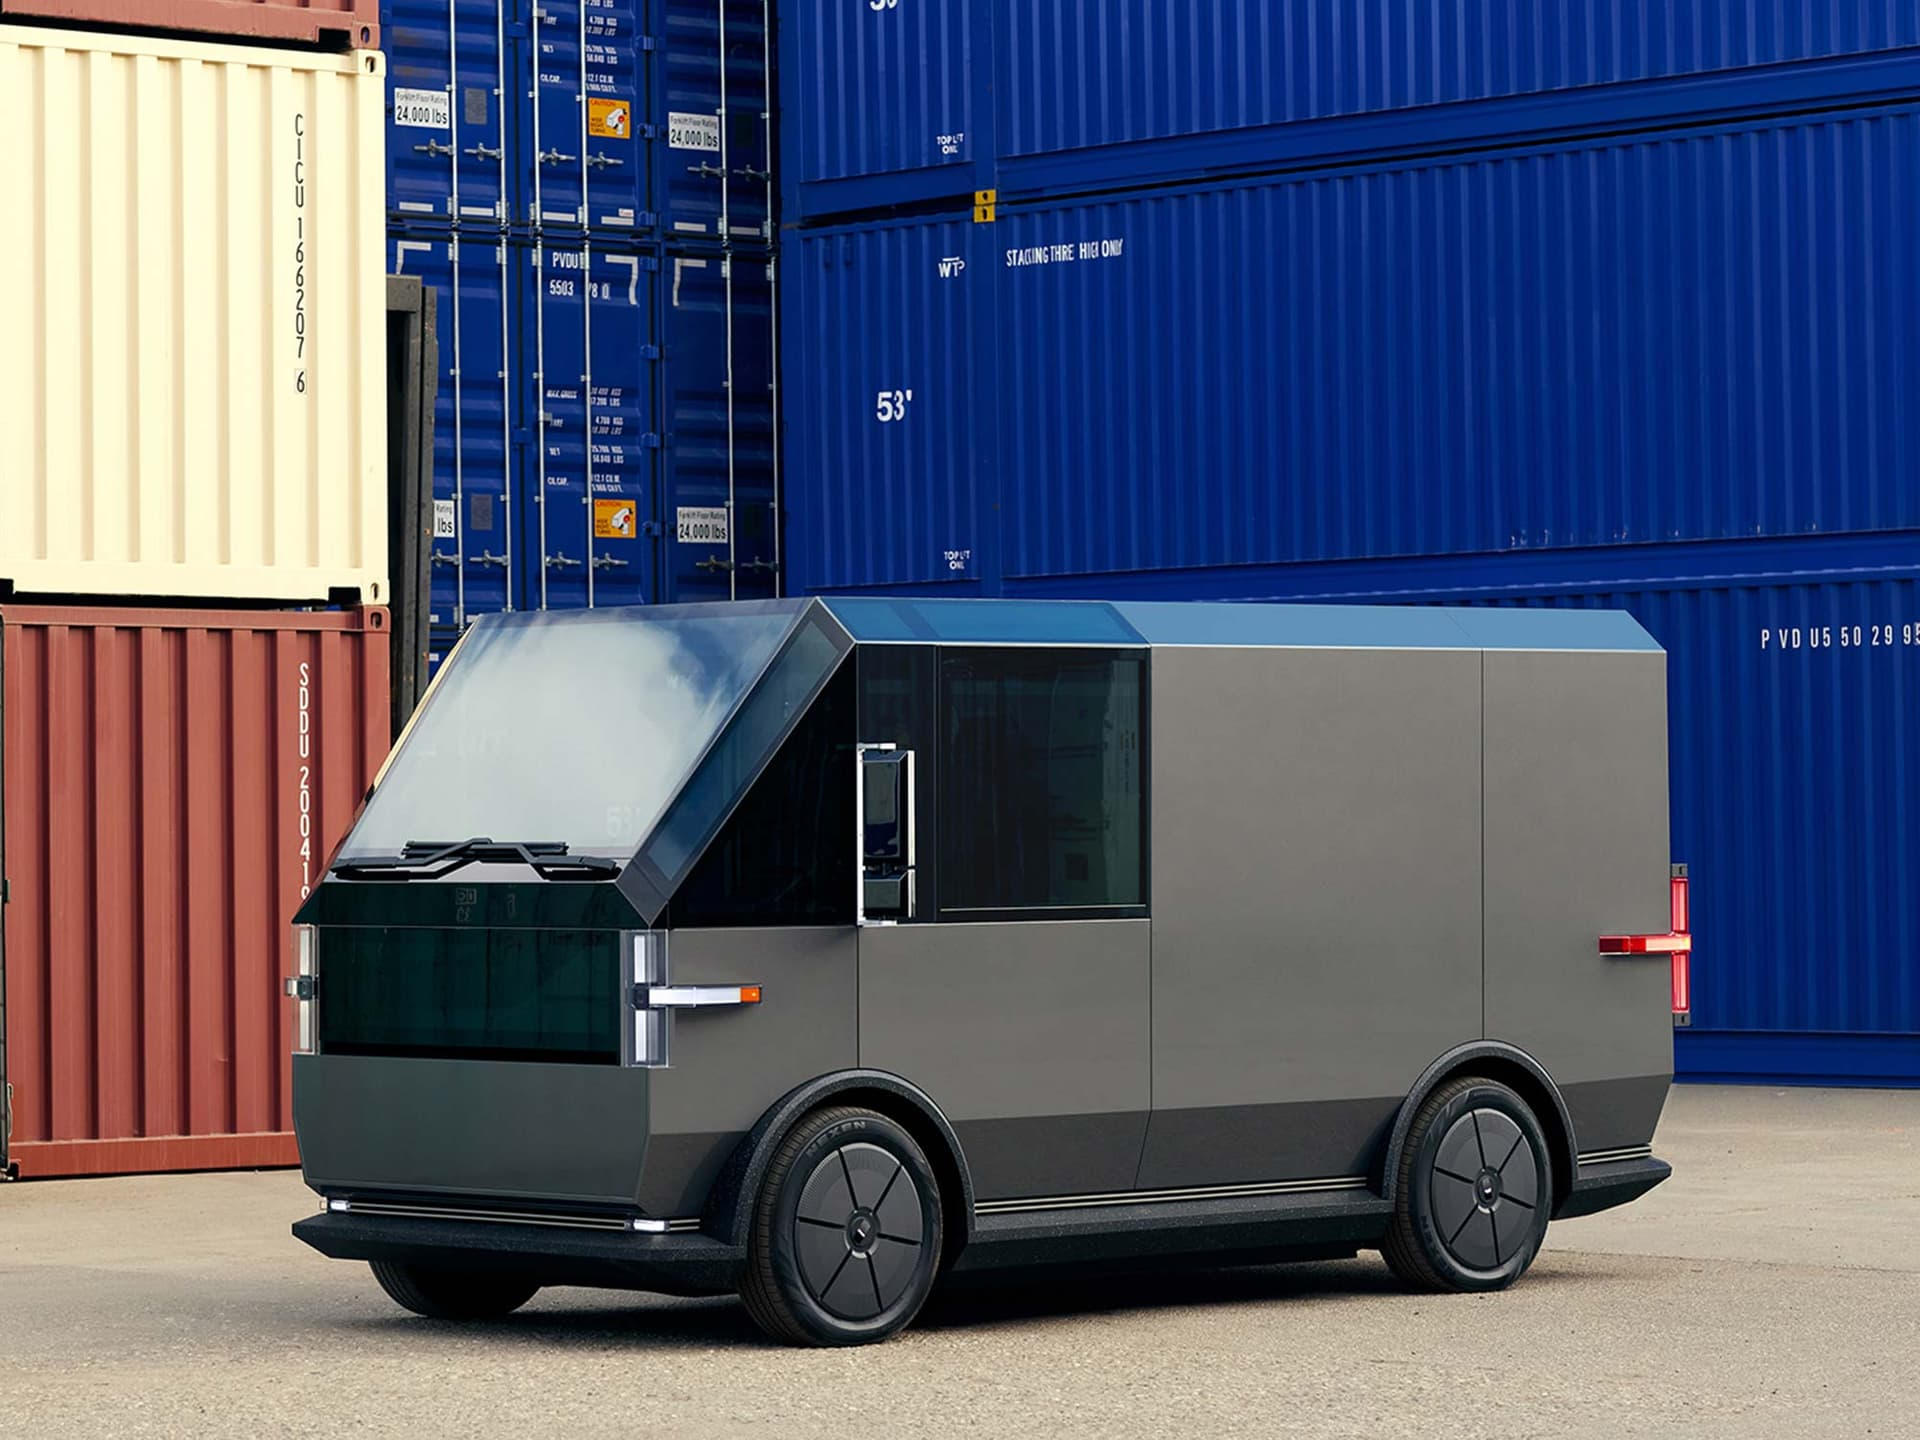 ev-start-up-canoo-unveils-new-vehicle-ahead-of-nasdaq-debut